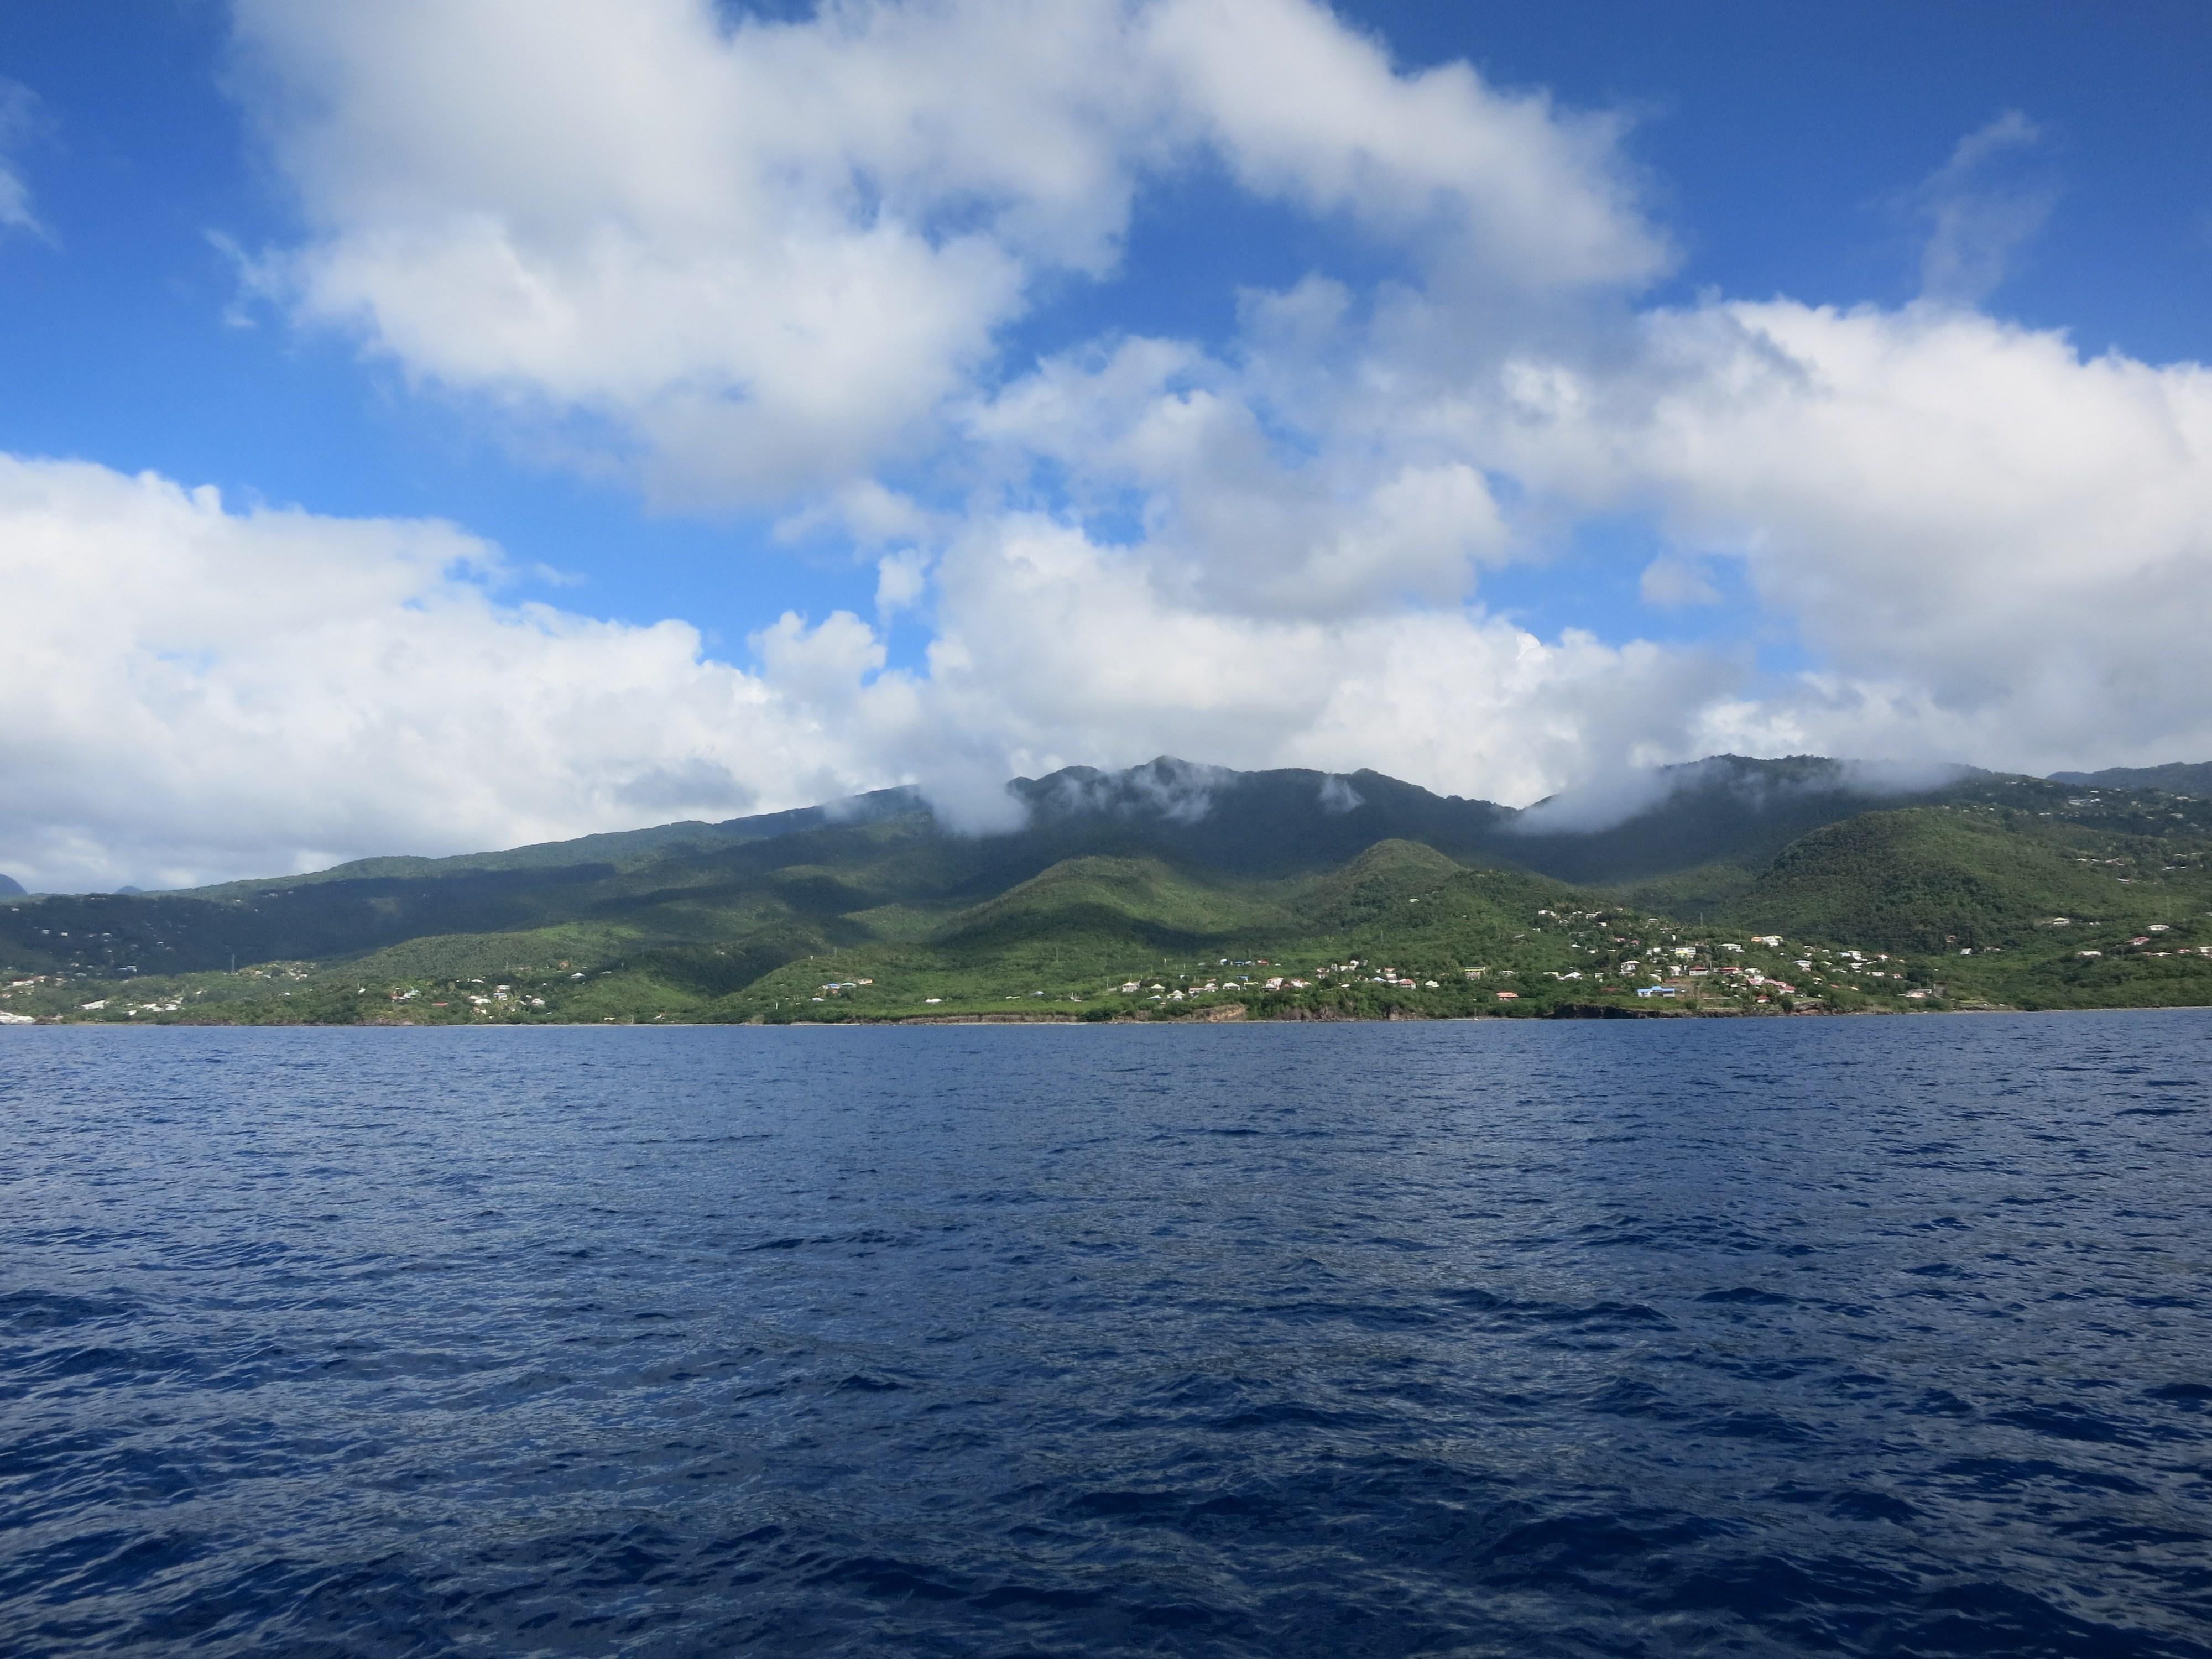 Noleggio Barche Pigeon Island - Navalia | Noleggia un Sogno